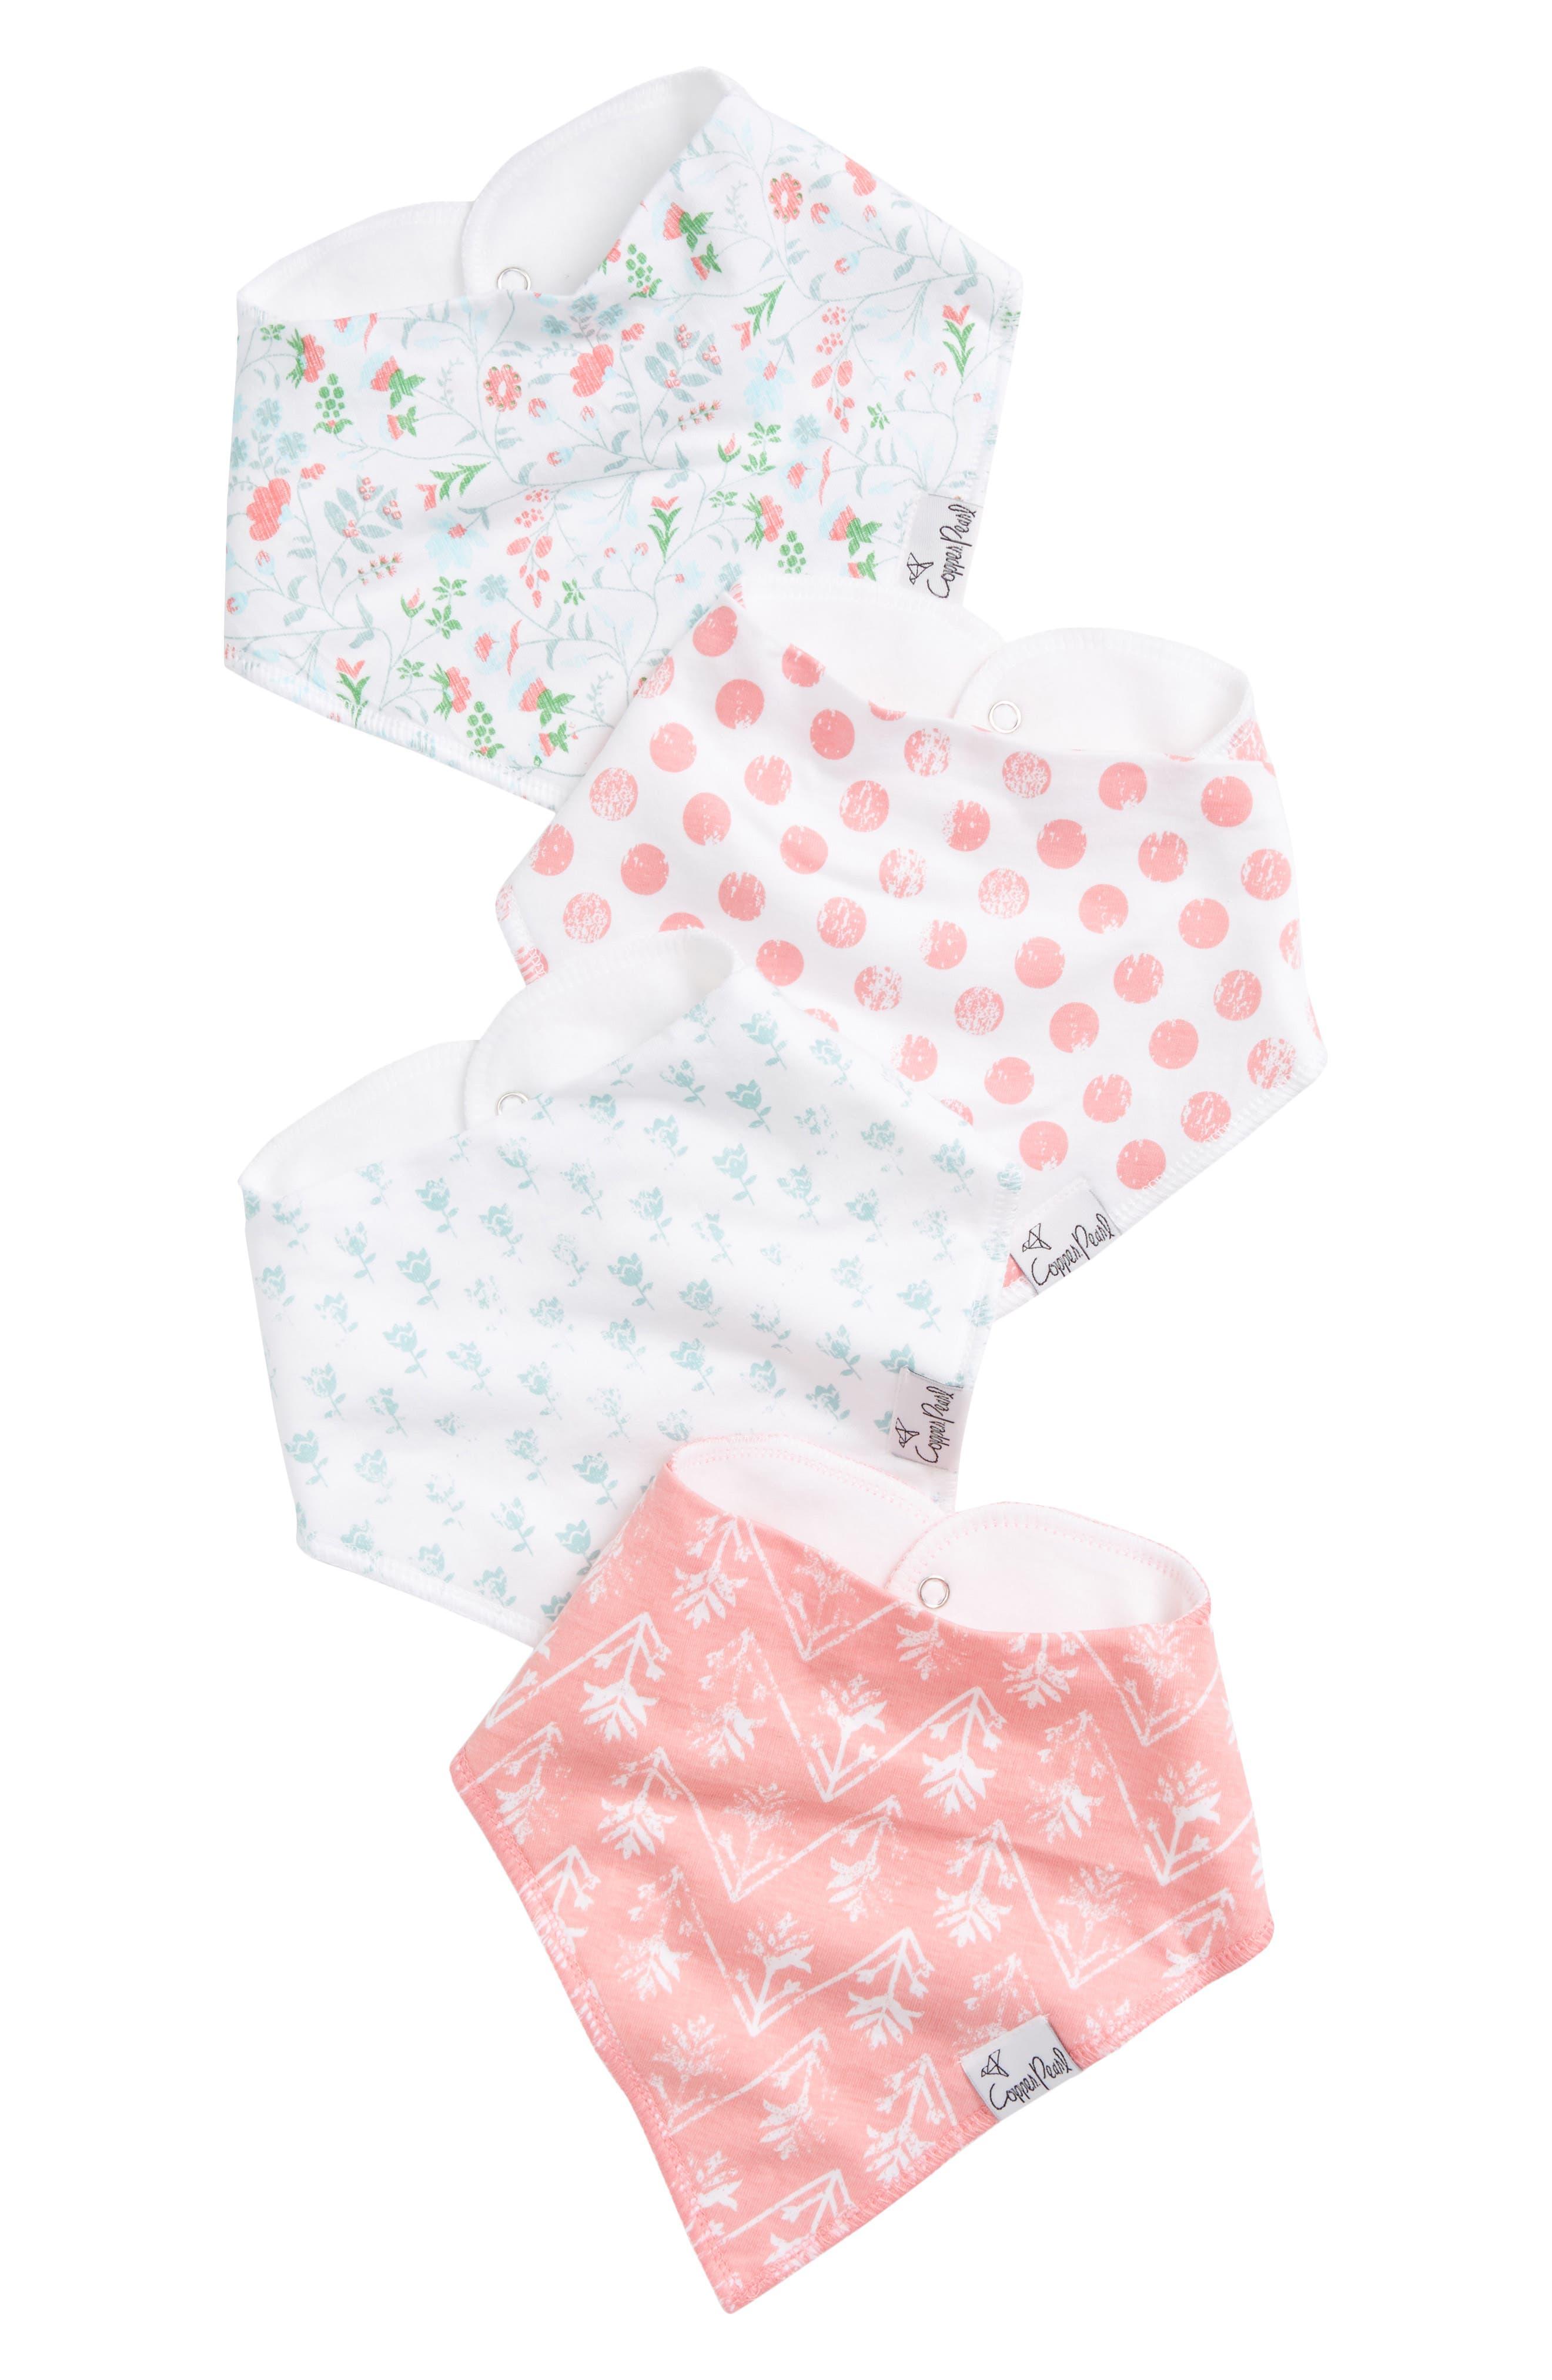 Main Image - Copper Pearl 4-Pack Bandana Bibs (Baby)